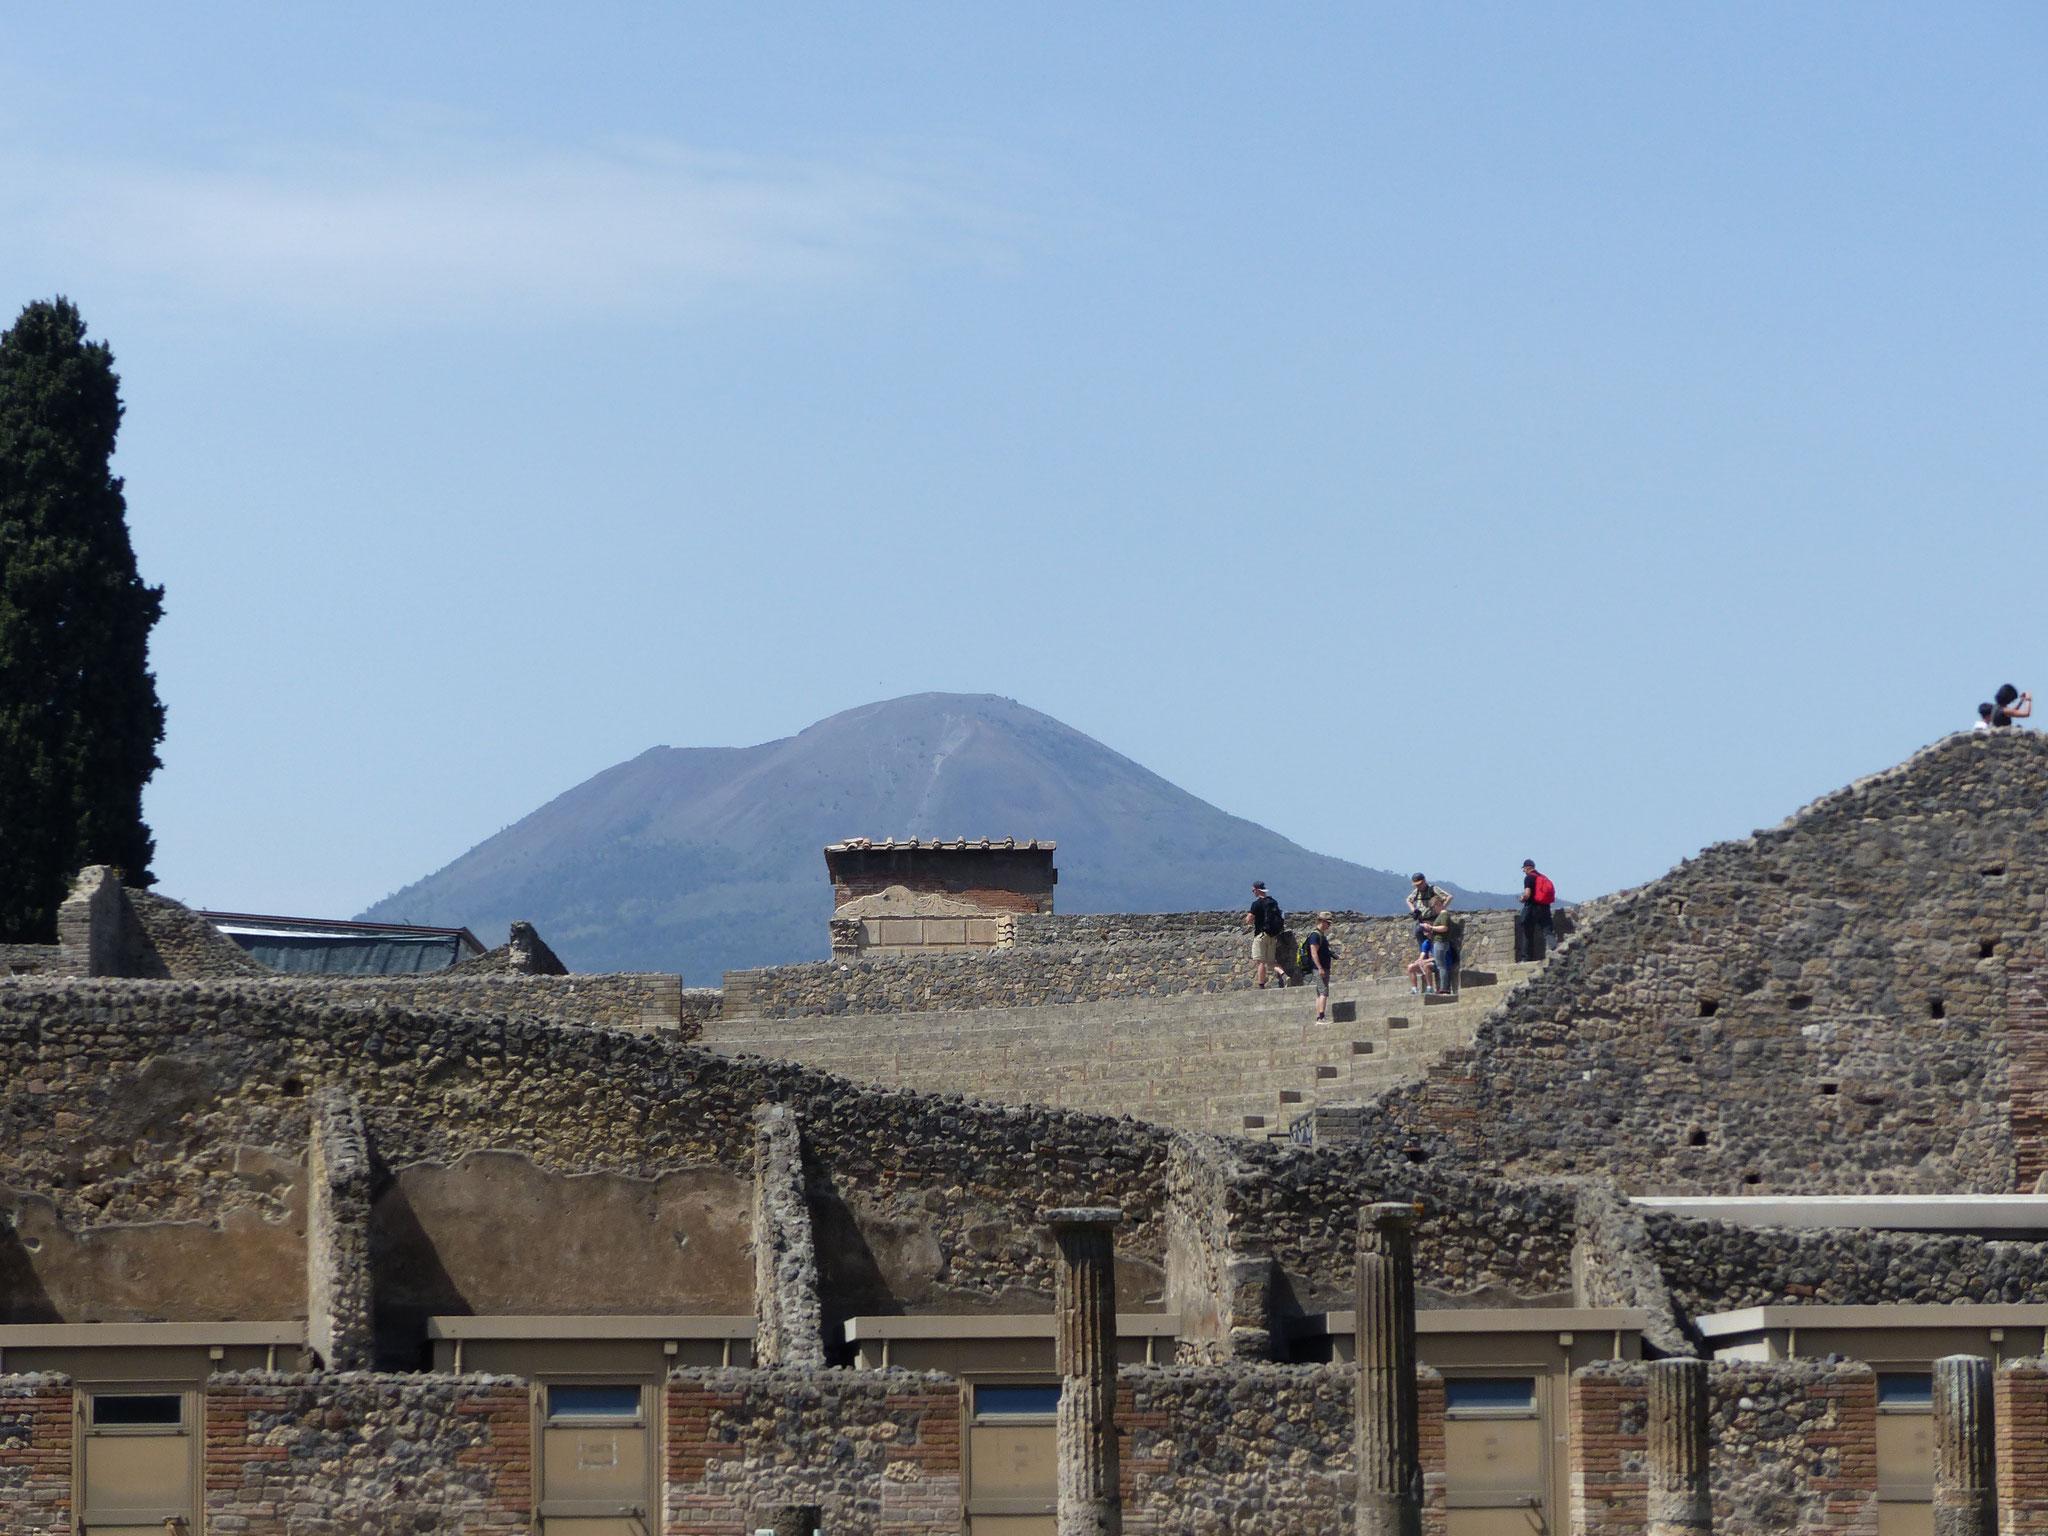 Eingang Pompeji mit Vesuv